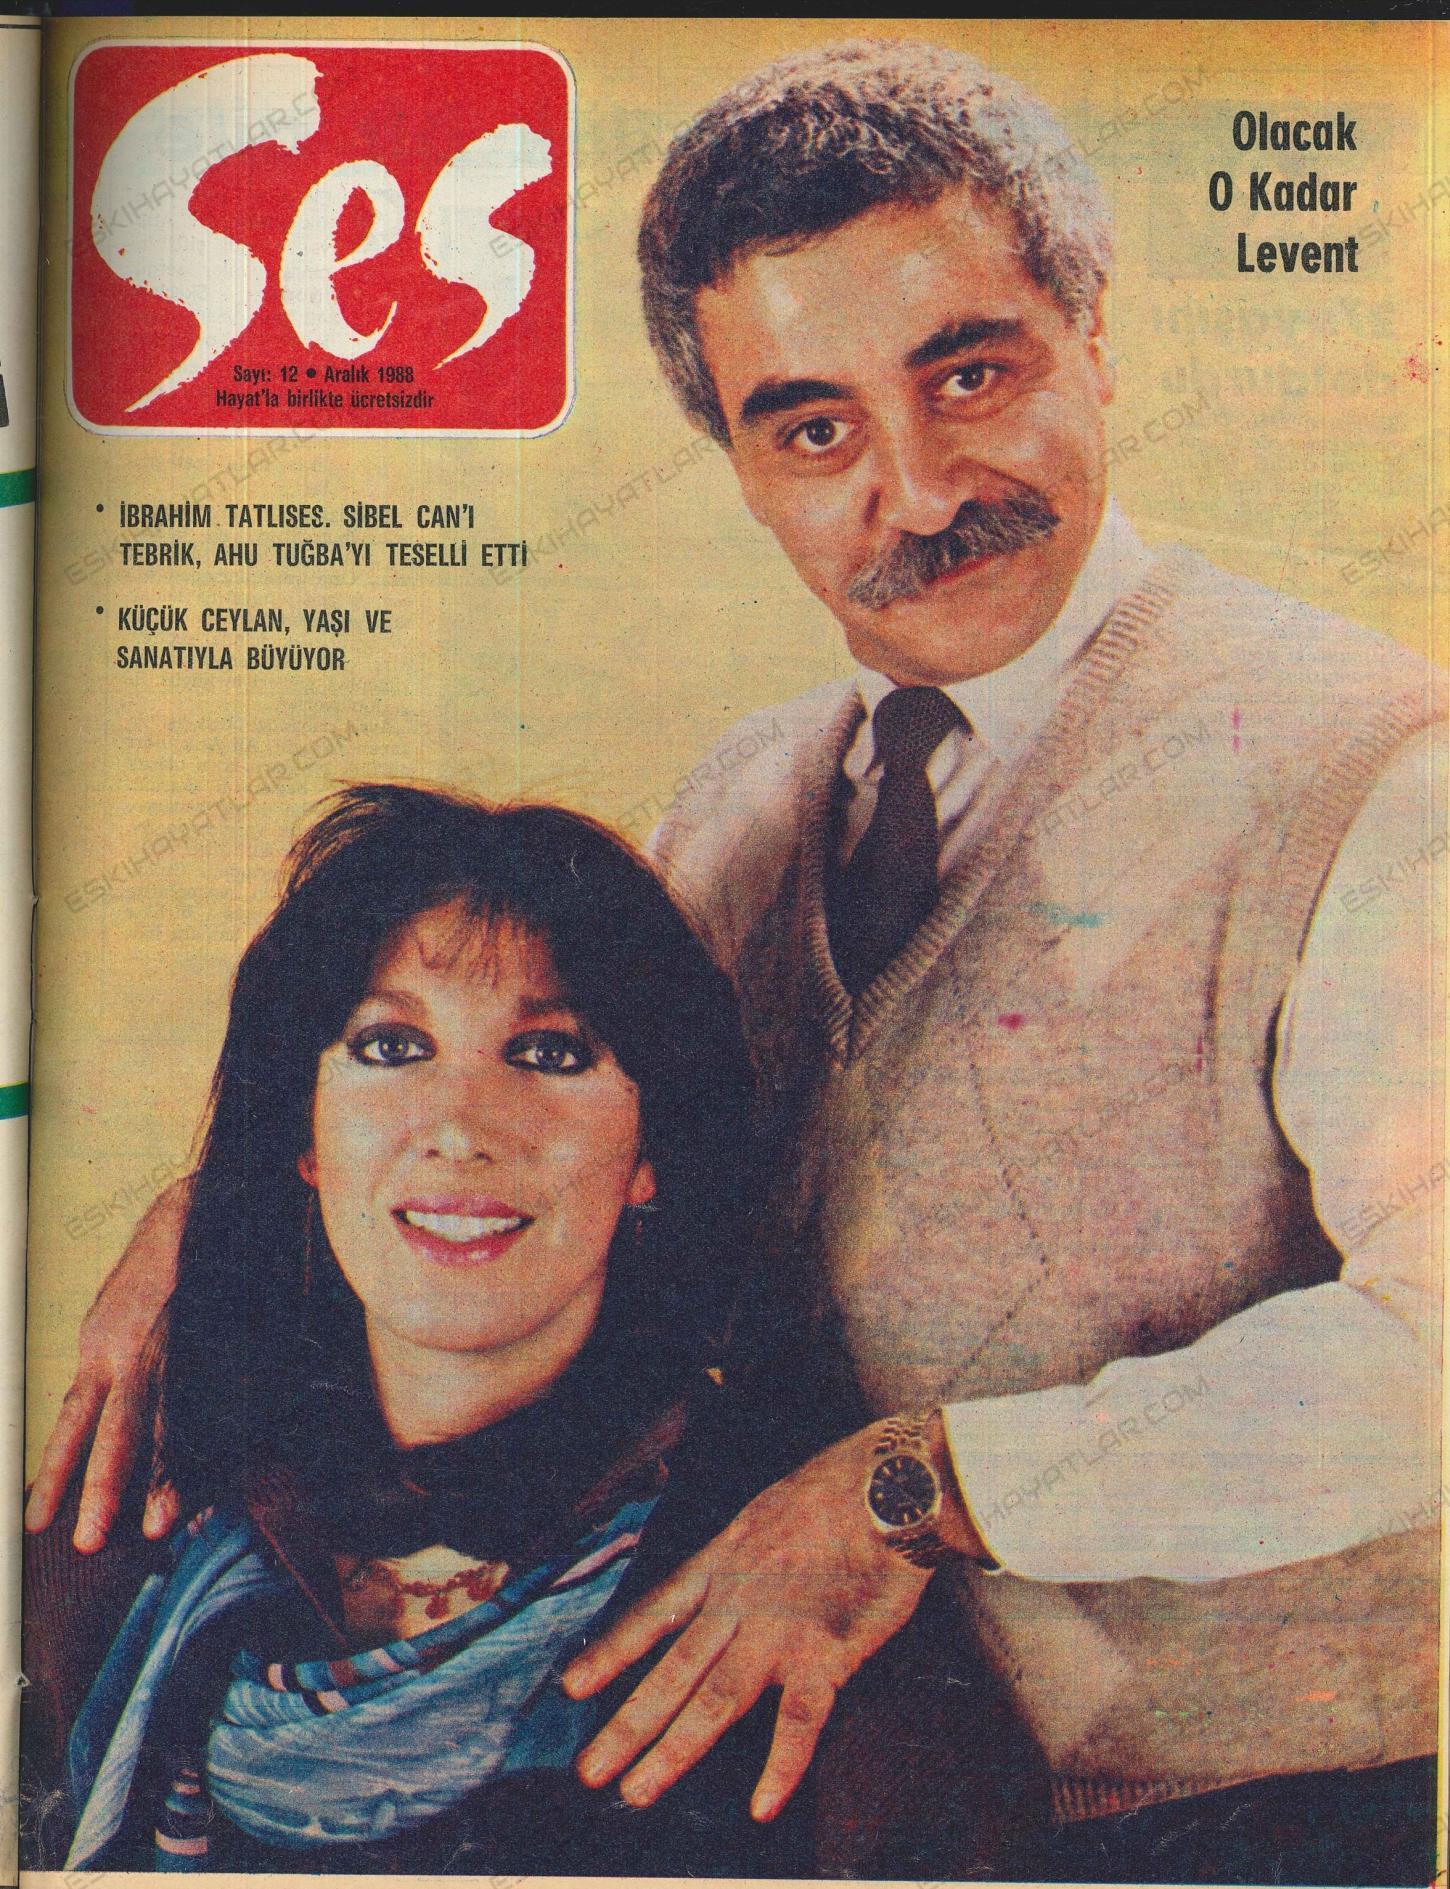 0256-kucuk-emrah-sizlerle-basbasa-1988-ses-dergisi-mektup-gondermek (4)